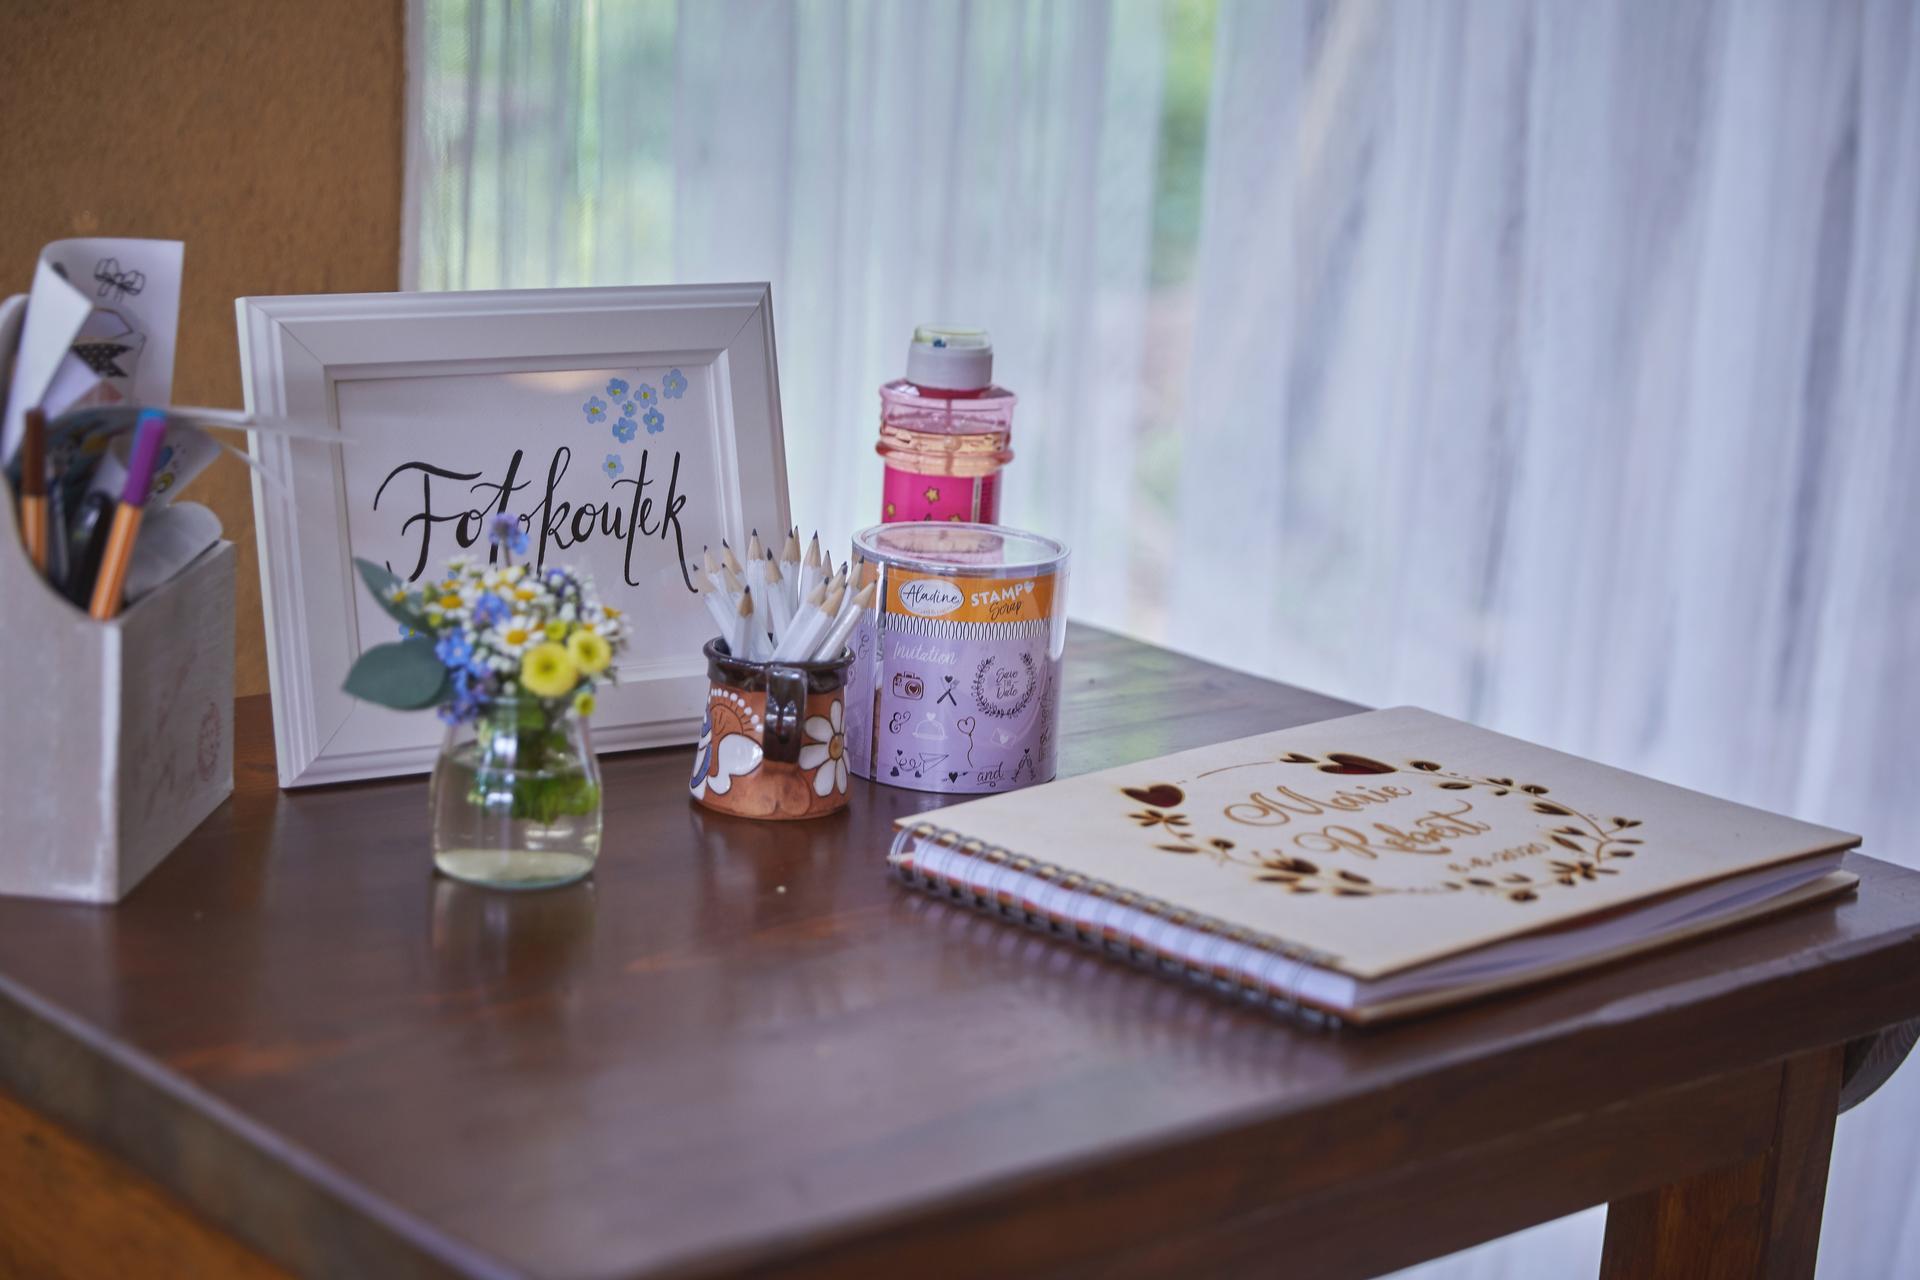 Svatba 6.6.2020 - Fotokoutek s knihou hostů.  Fotokniha: Katuans